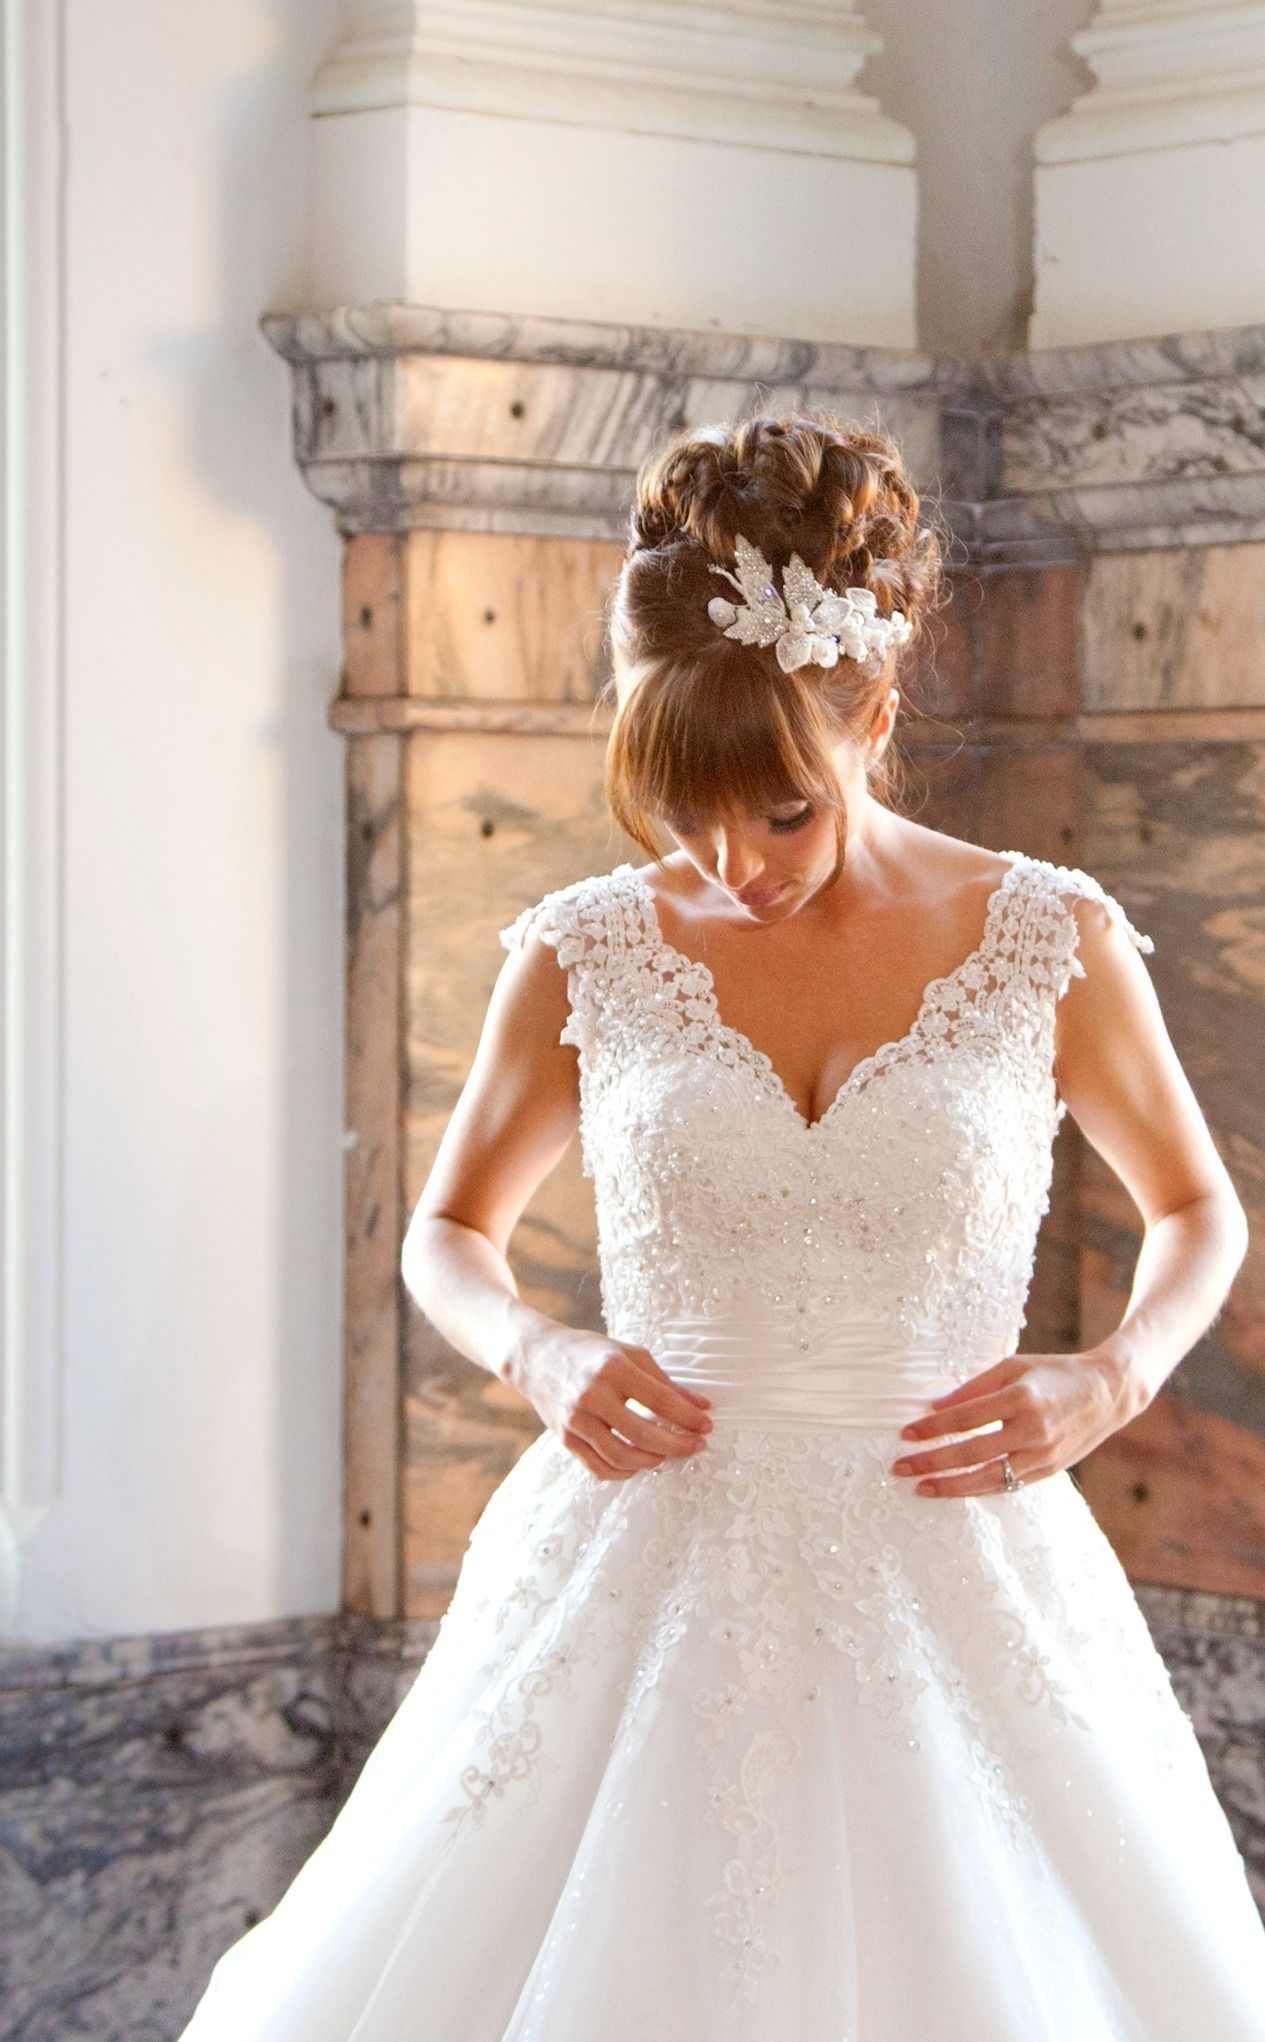 updo with bangs + no veil | wedding bells | casual wedding